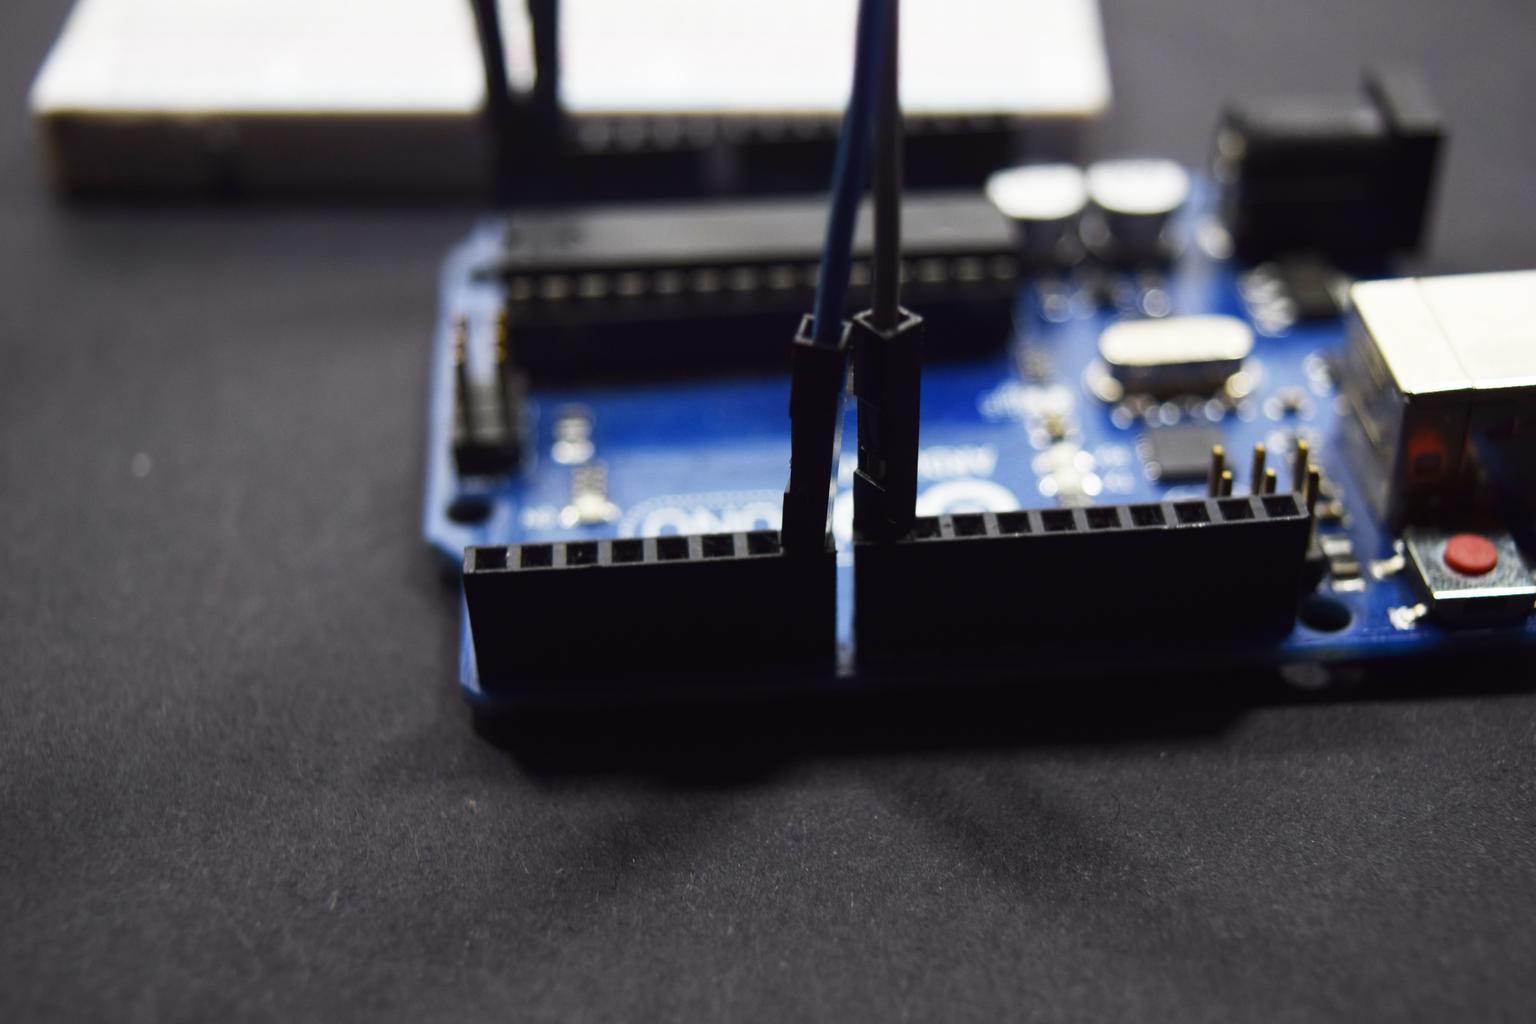 HC-05 Ultrasonic Sensor: